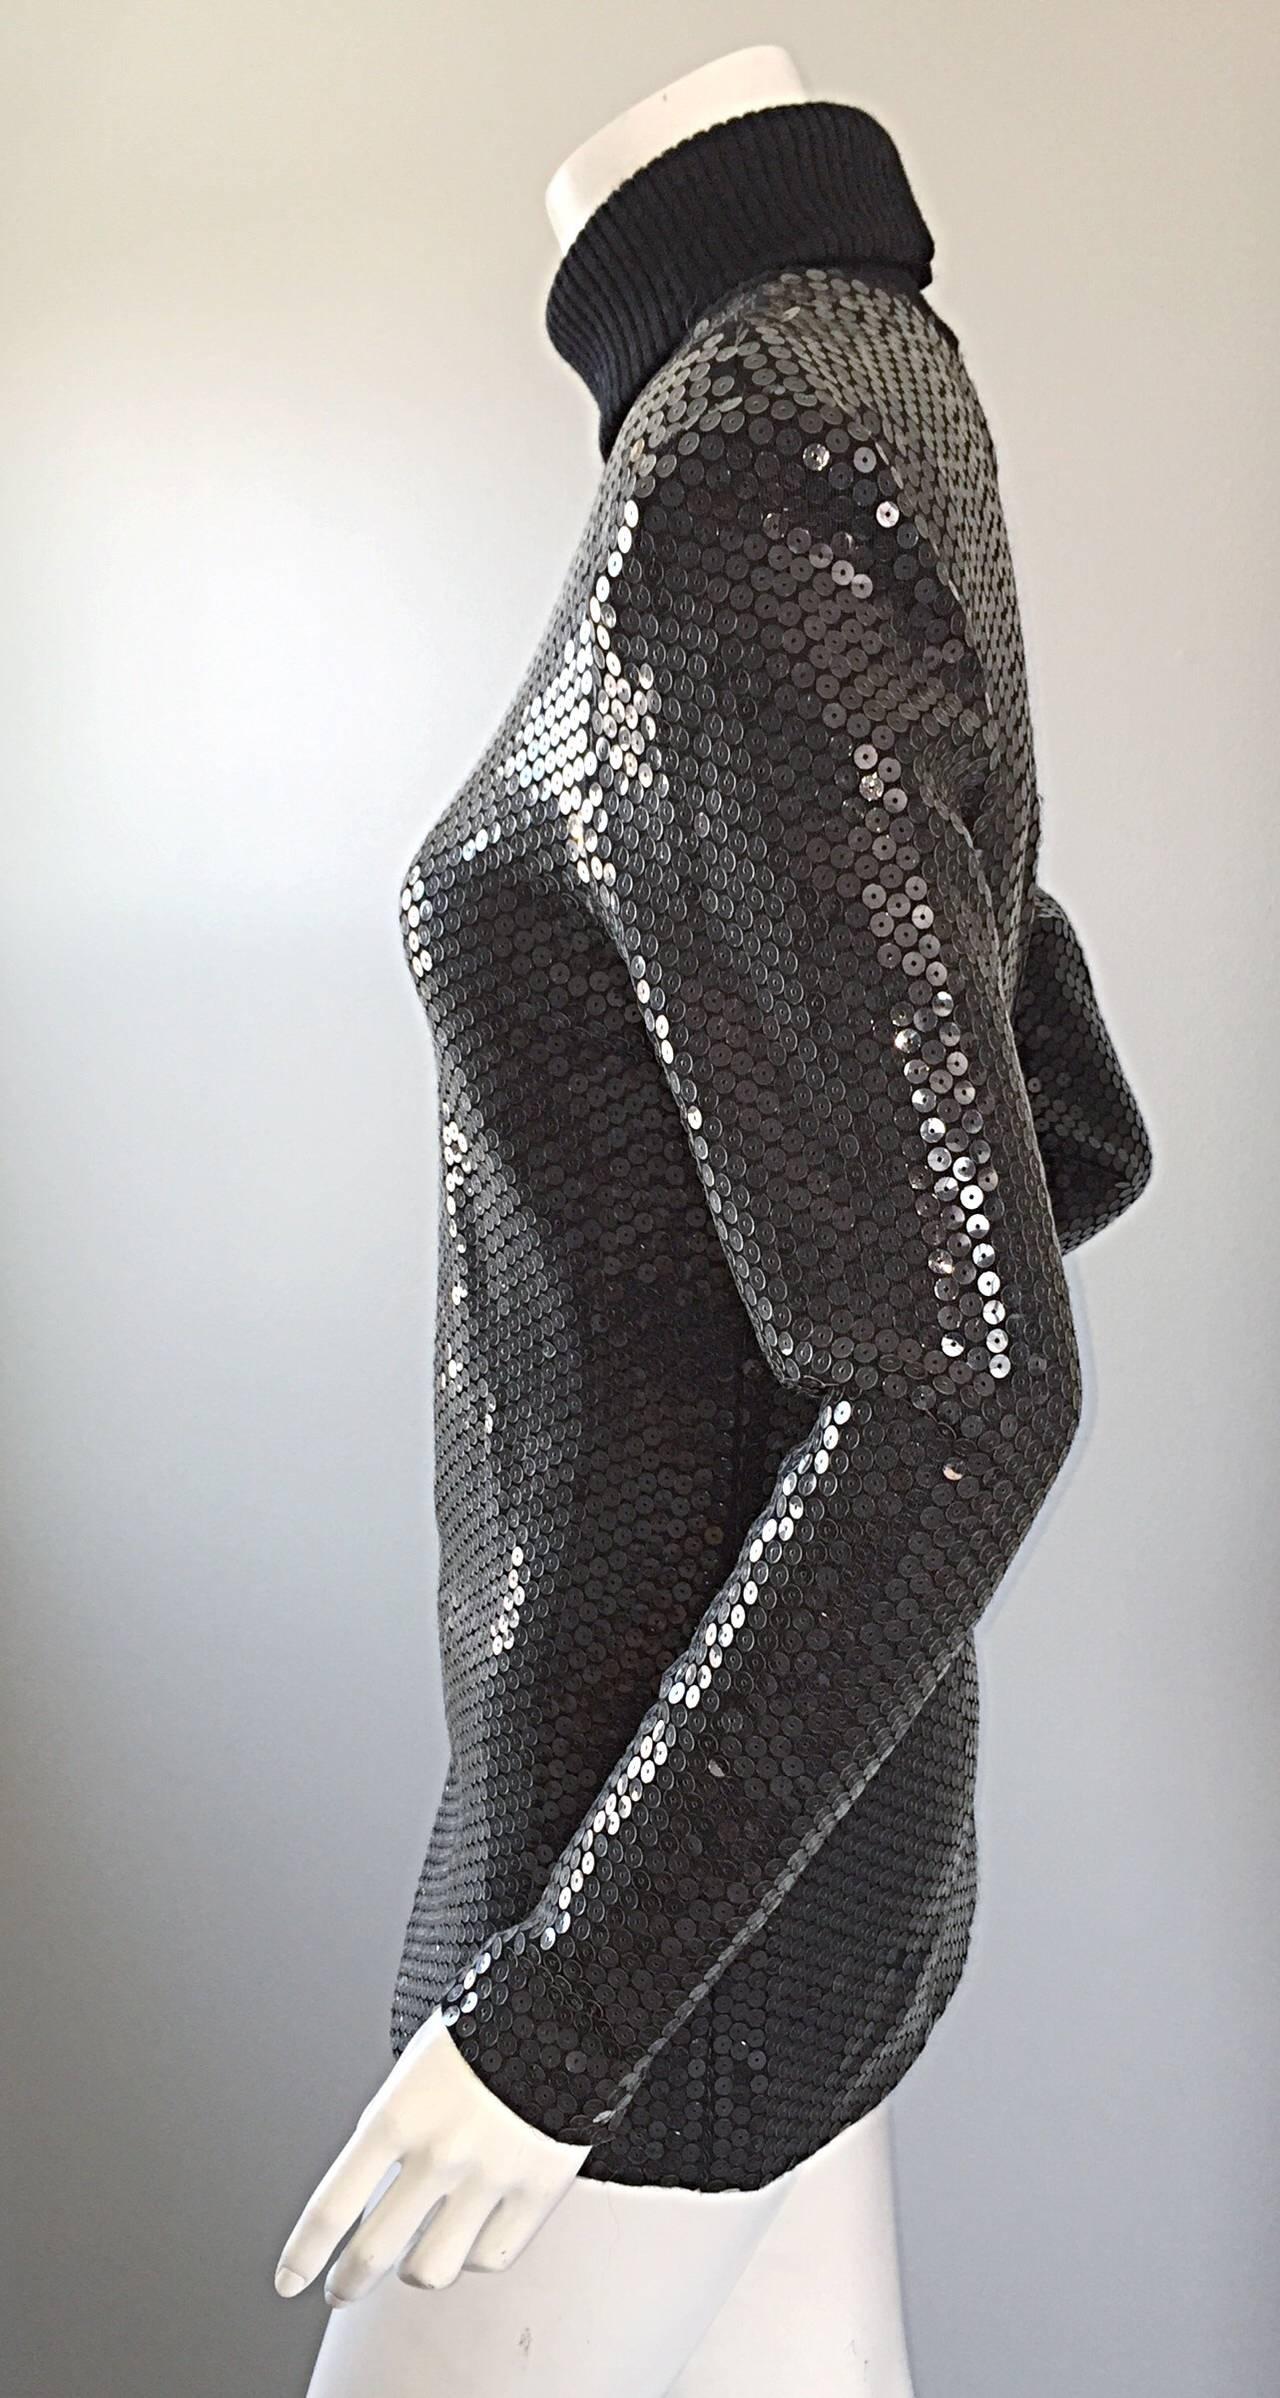 Rare Very Early Michael Kors Runway Sample Gray Sequins Turtleneck Sweater 7